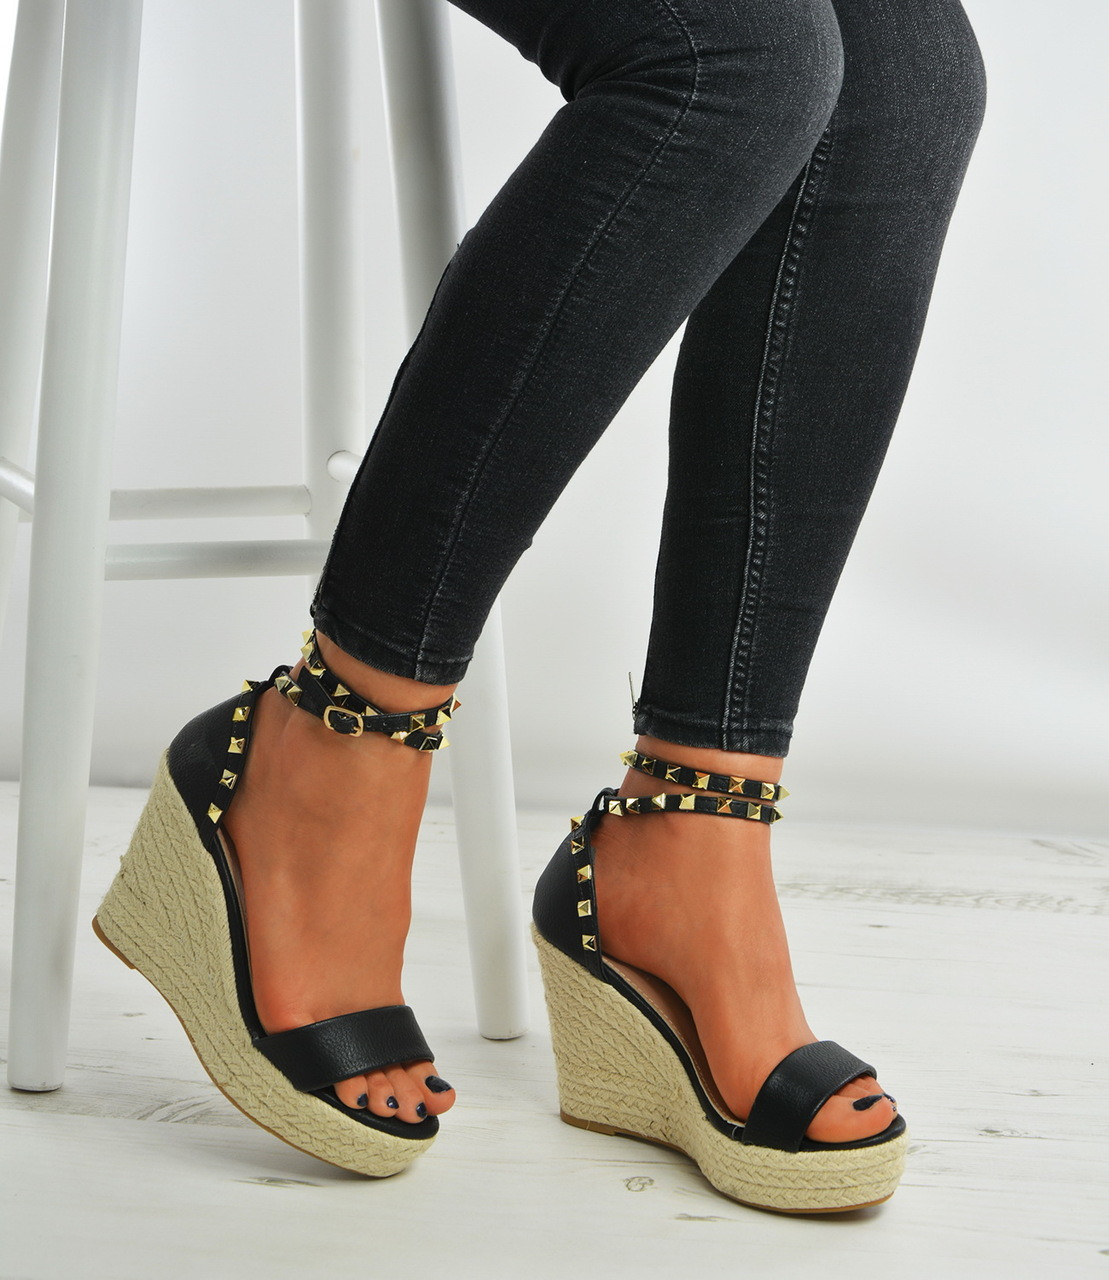 3e8222e49fa New Womens Ladies Espadrille High Heel Wedges Studded Platforms ...